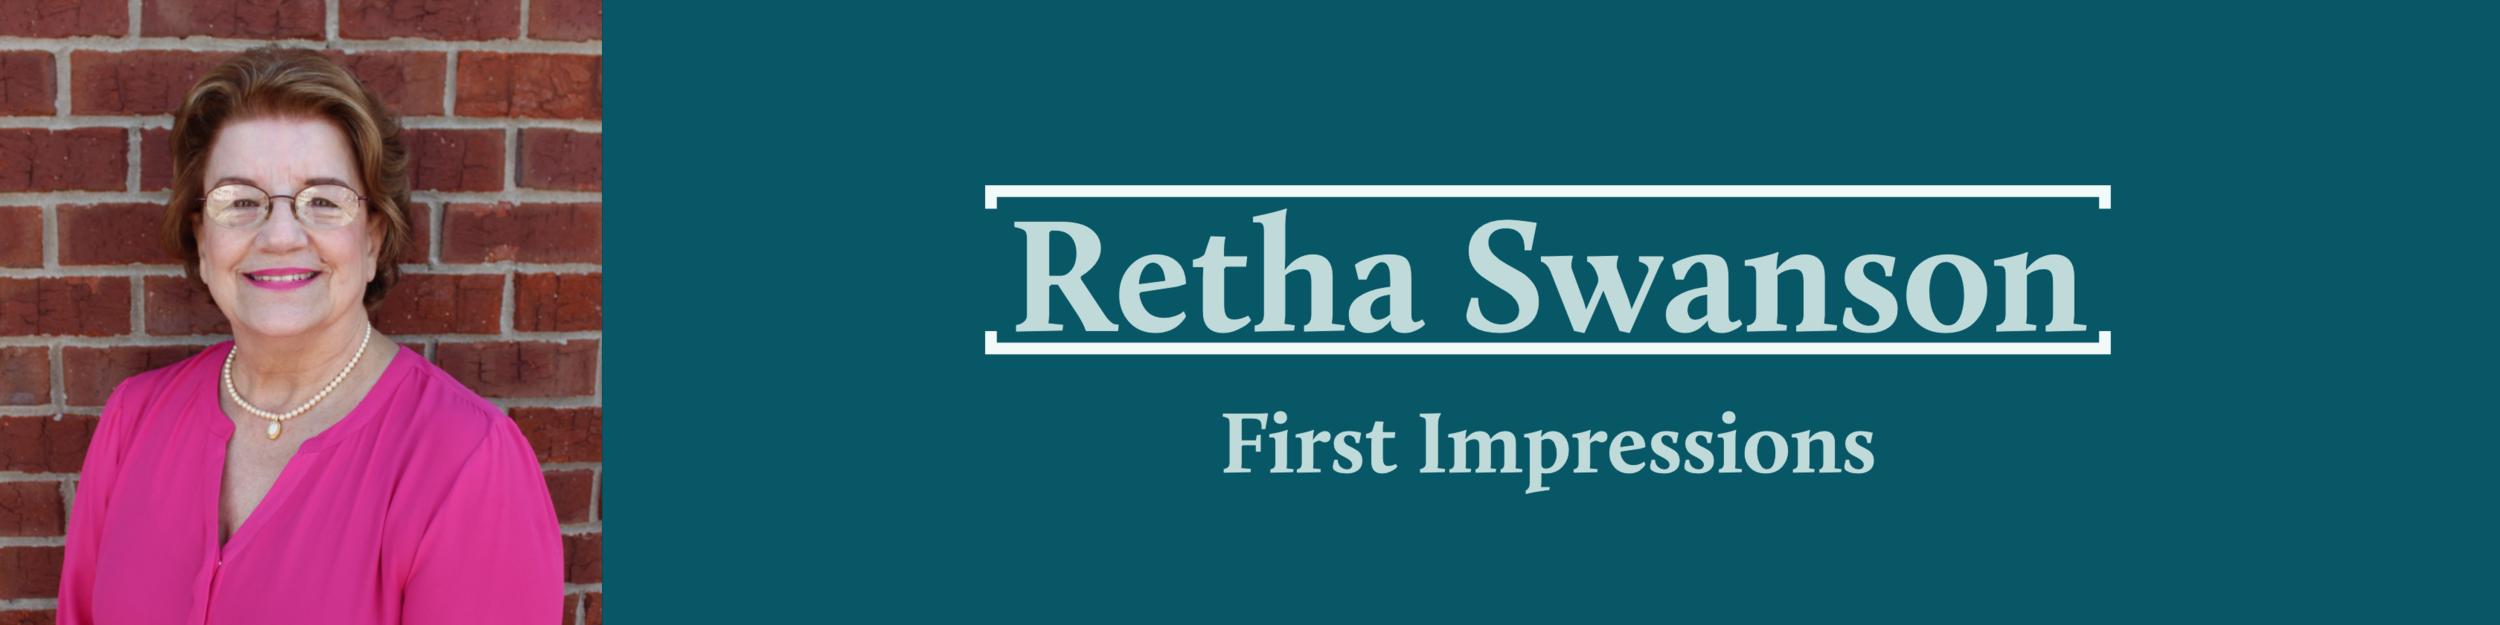 Retha Swanson Banner(1).png